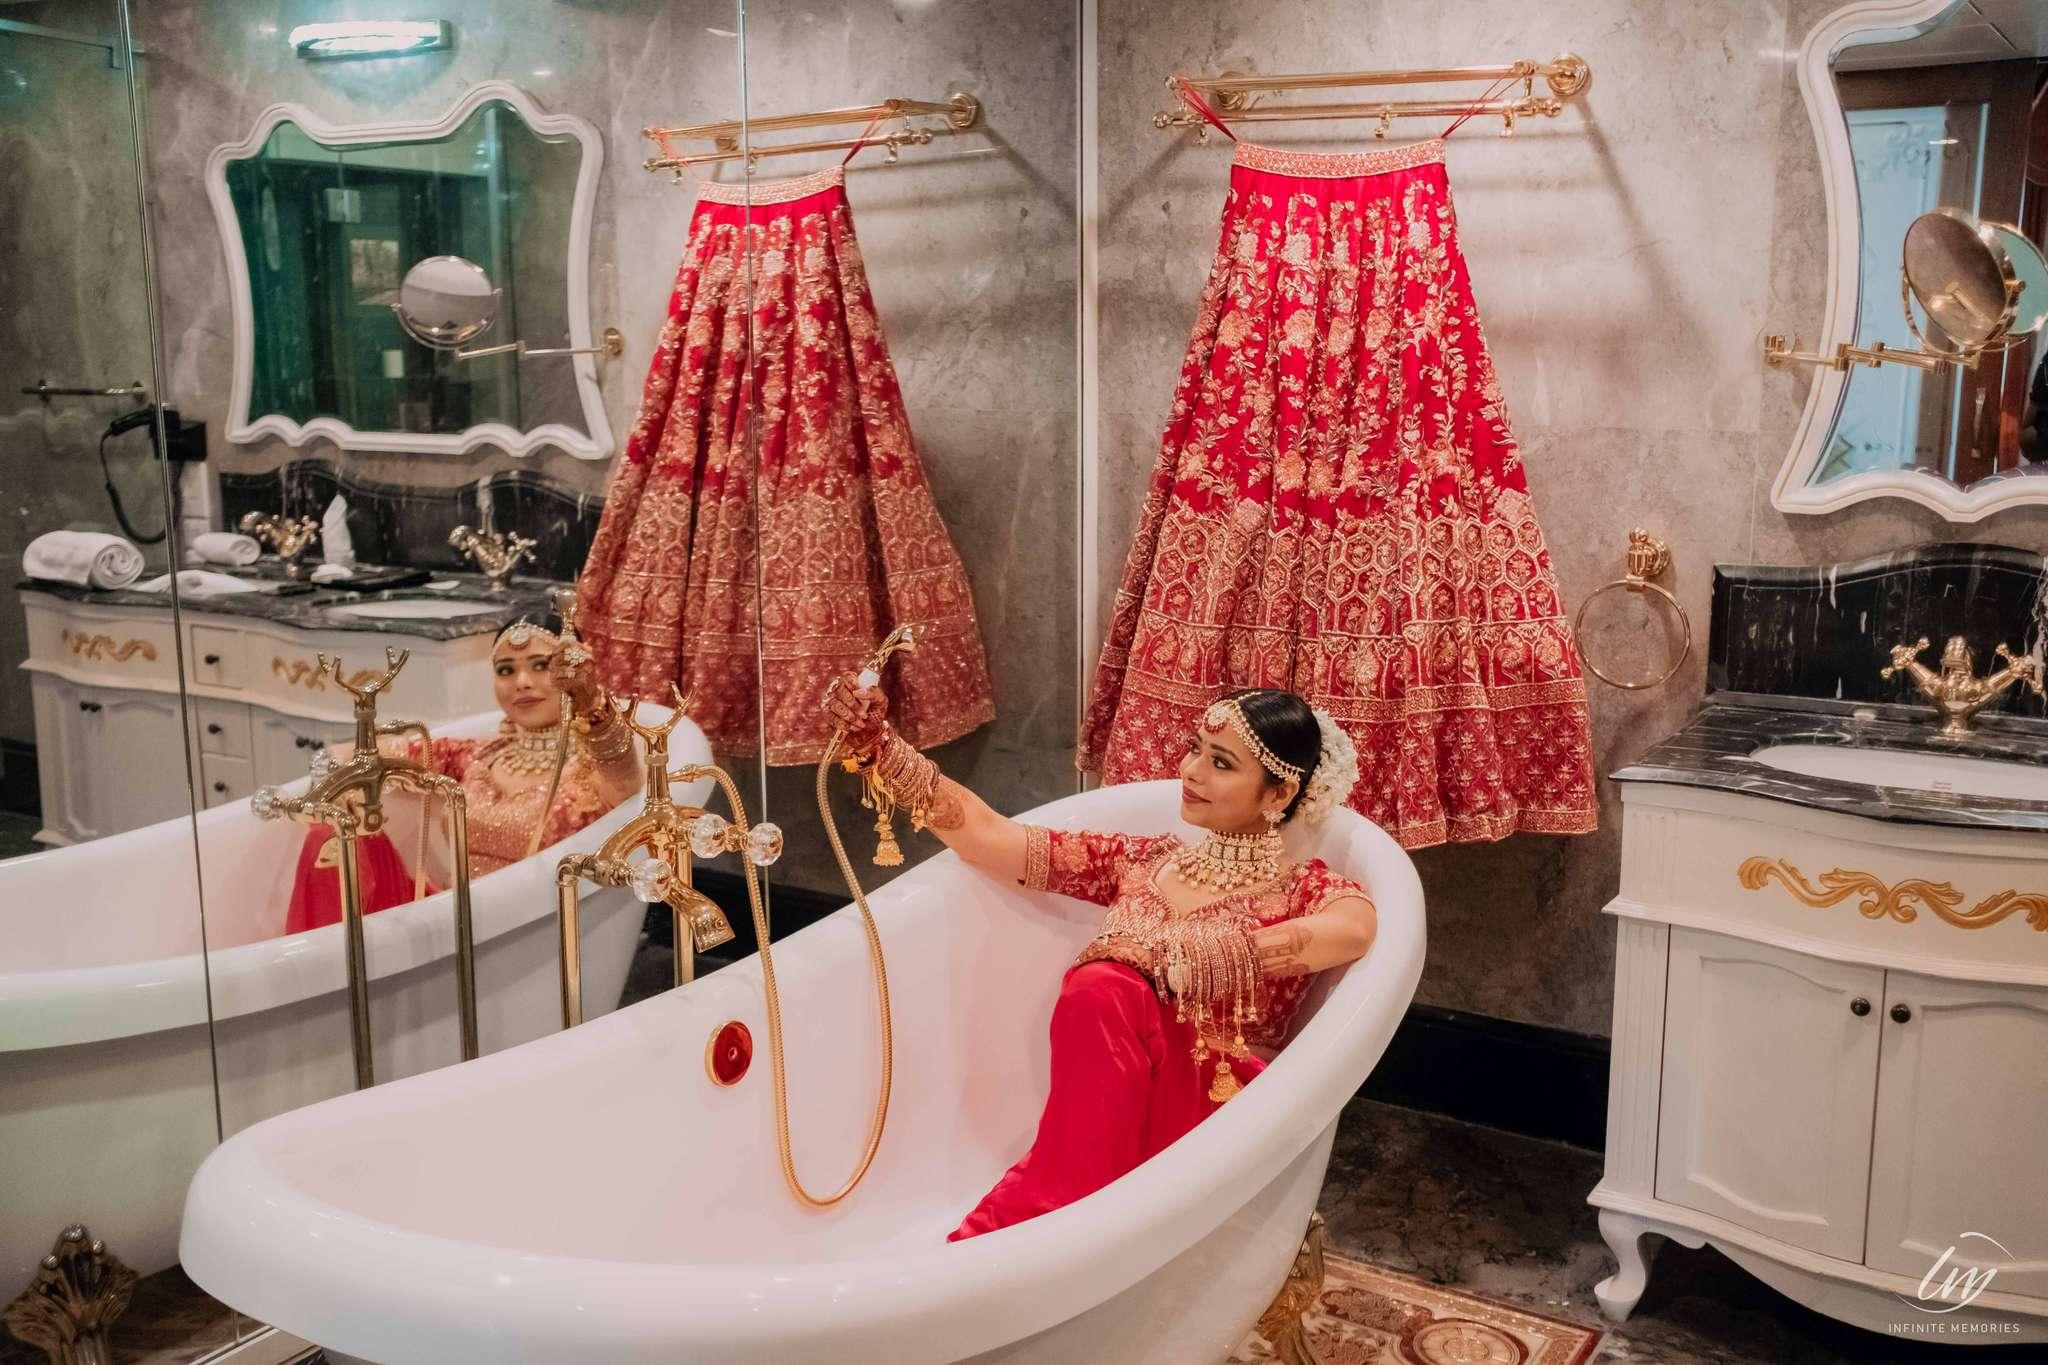 Pragya painted the town red in her gorgeous wedding lehenga!